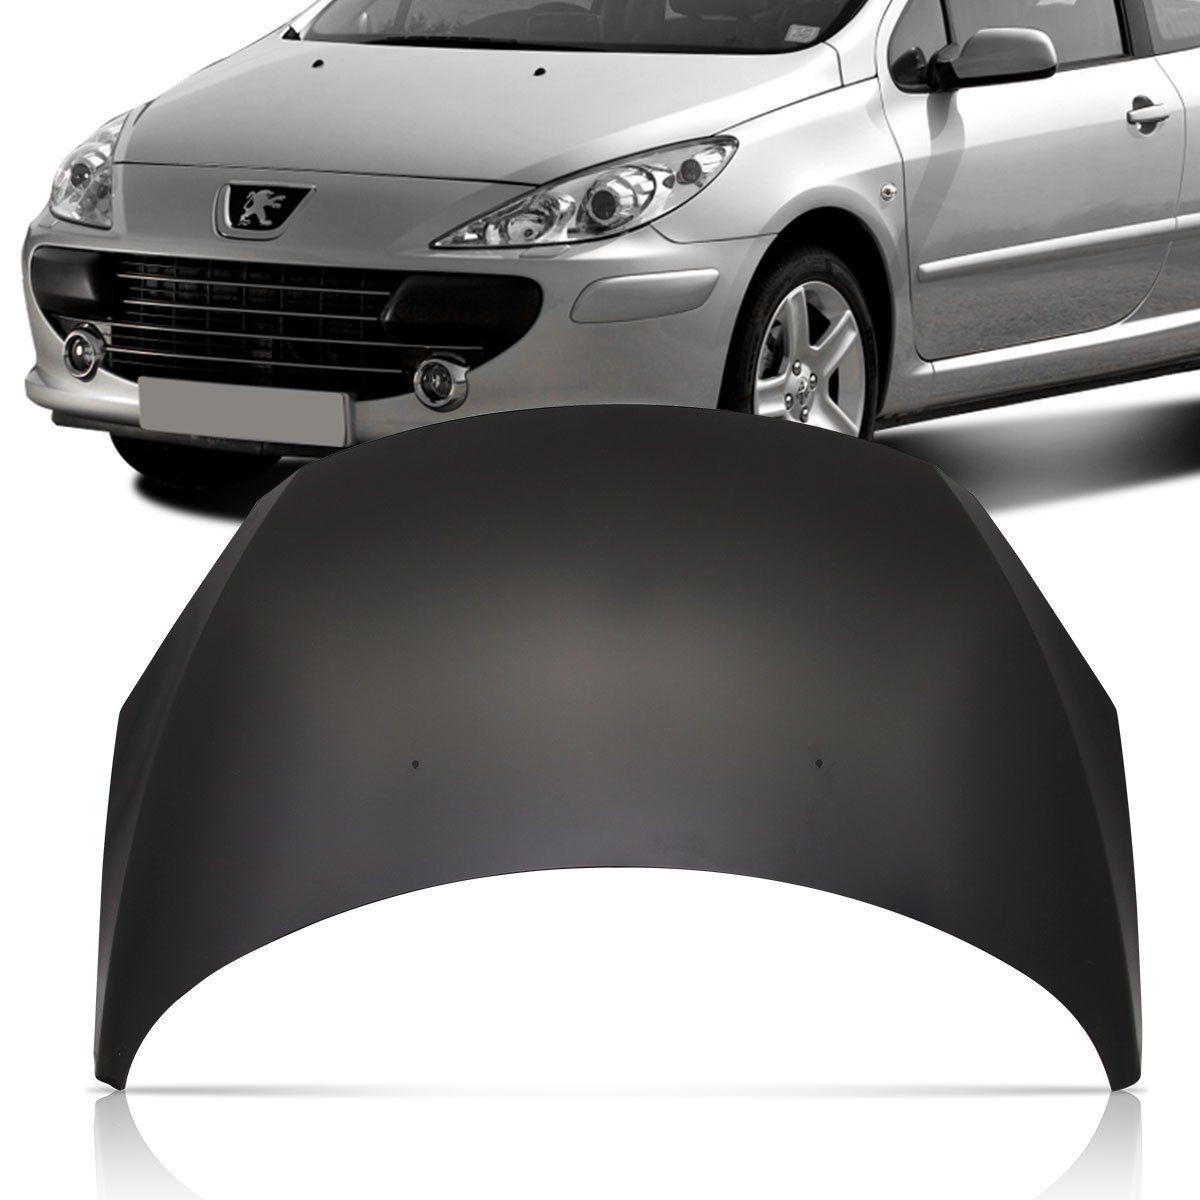 Capo Peugeot 307 2007 2008 2009 2010 2011 2012